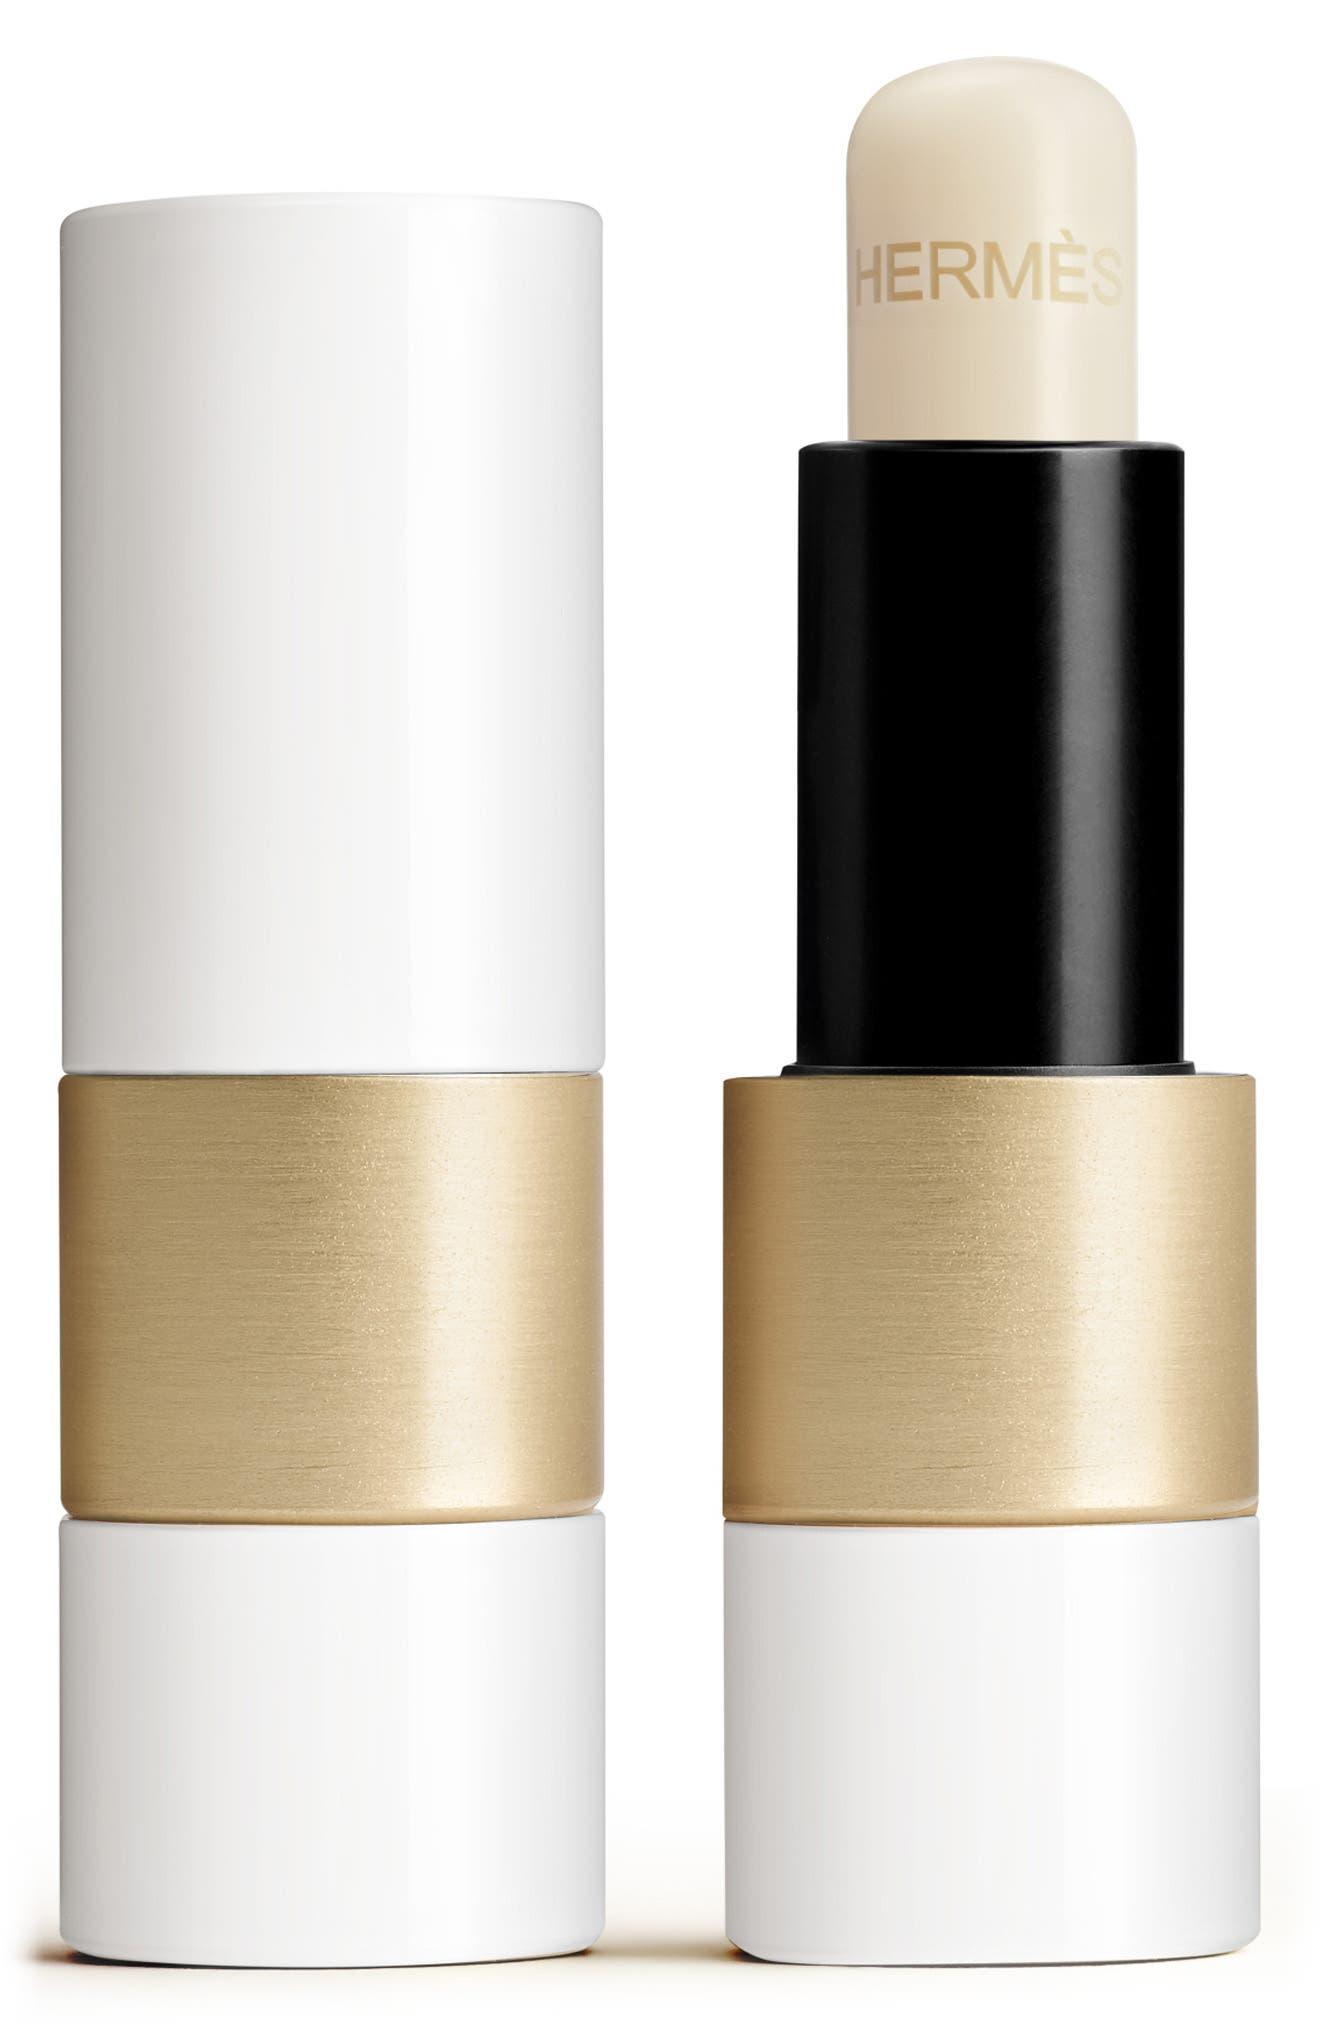 Rouge Hermès - Lip care balm | Nordstrom